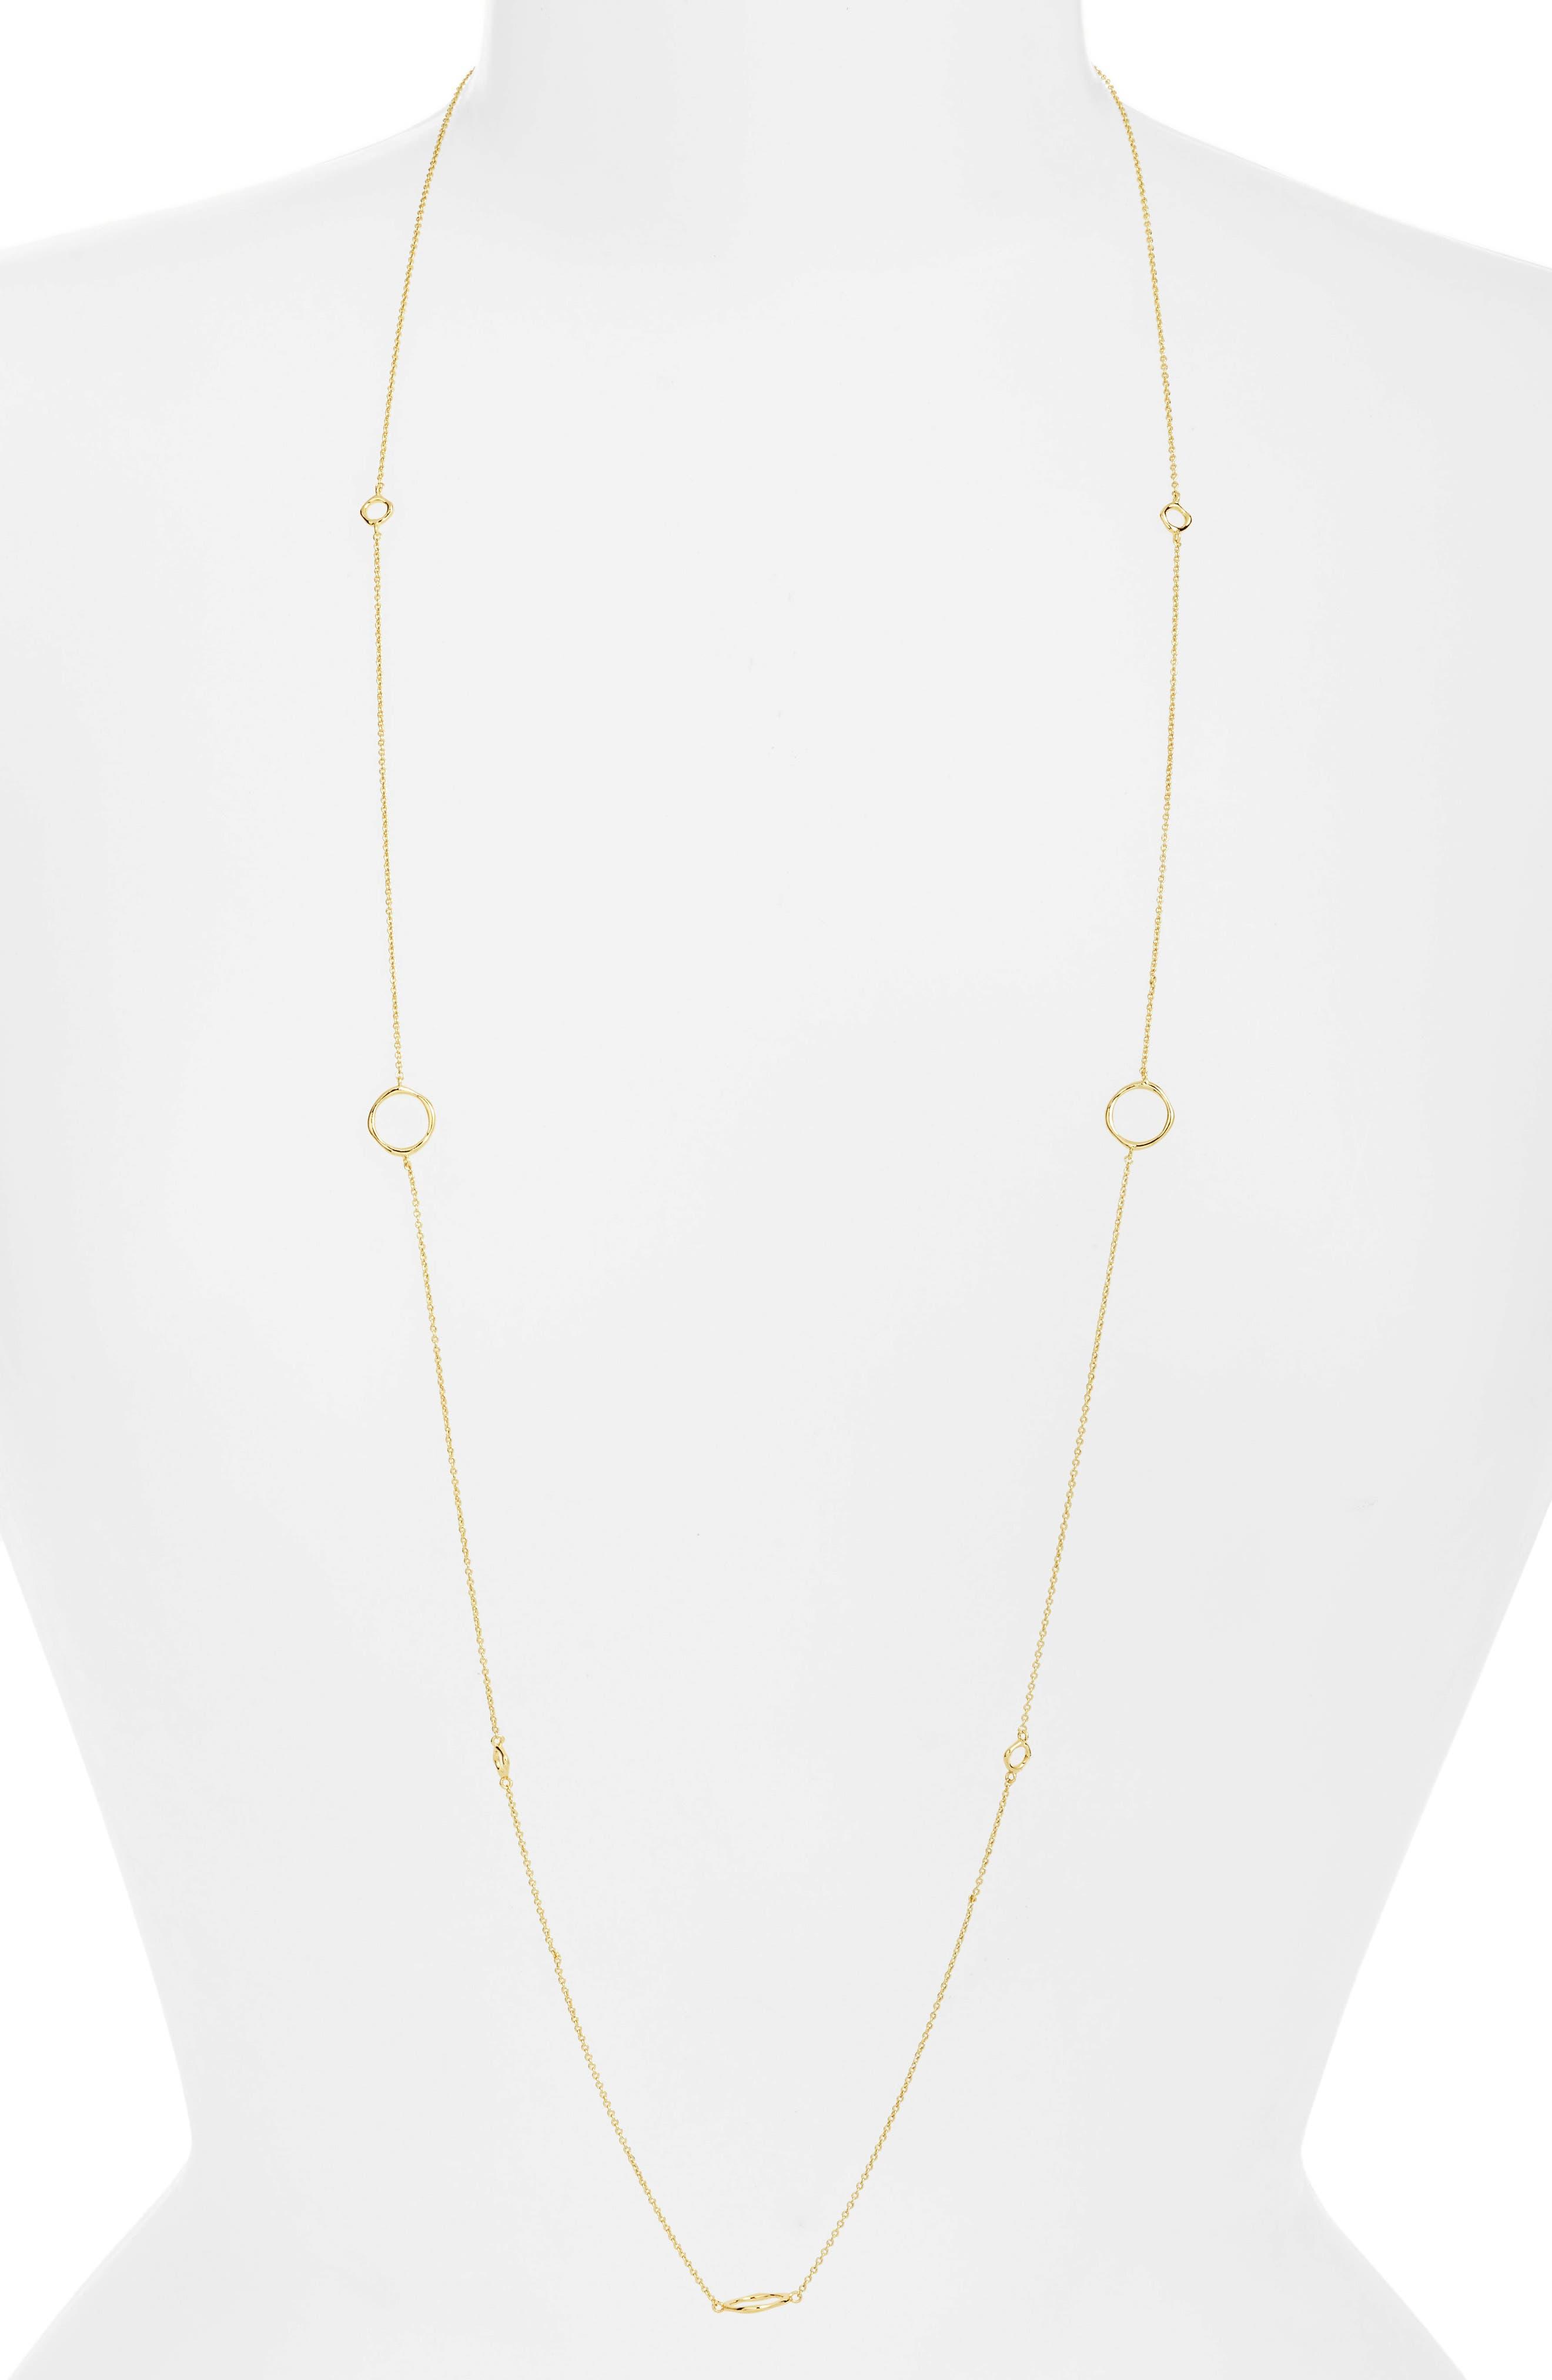 GORJANA, Quinn Wrap Necklace, Main thumbnail 1, color, GOLD